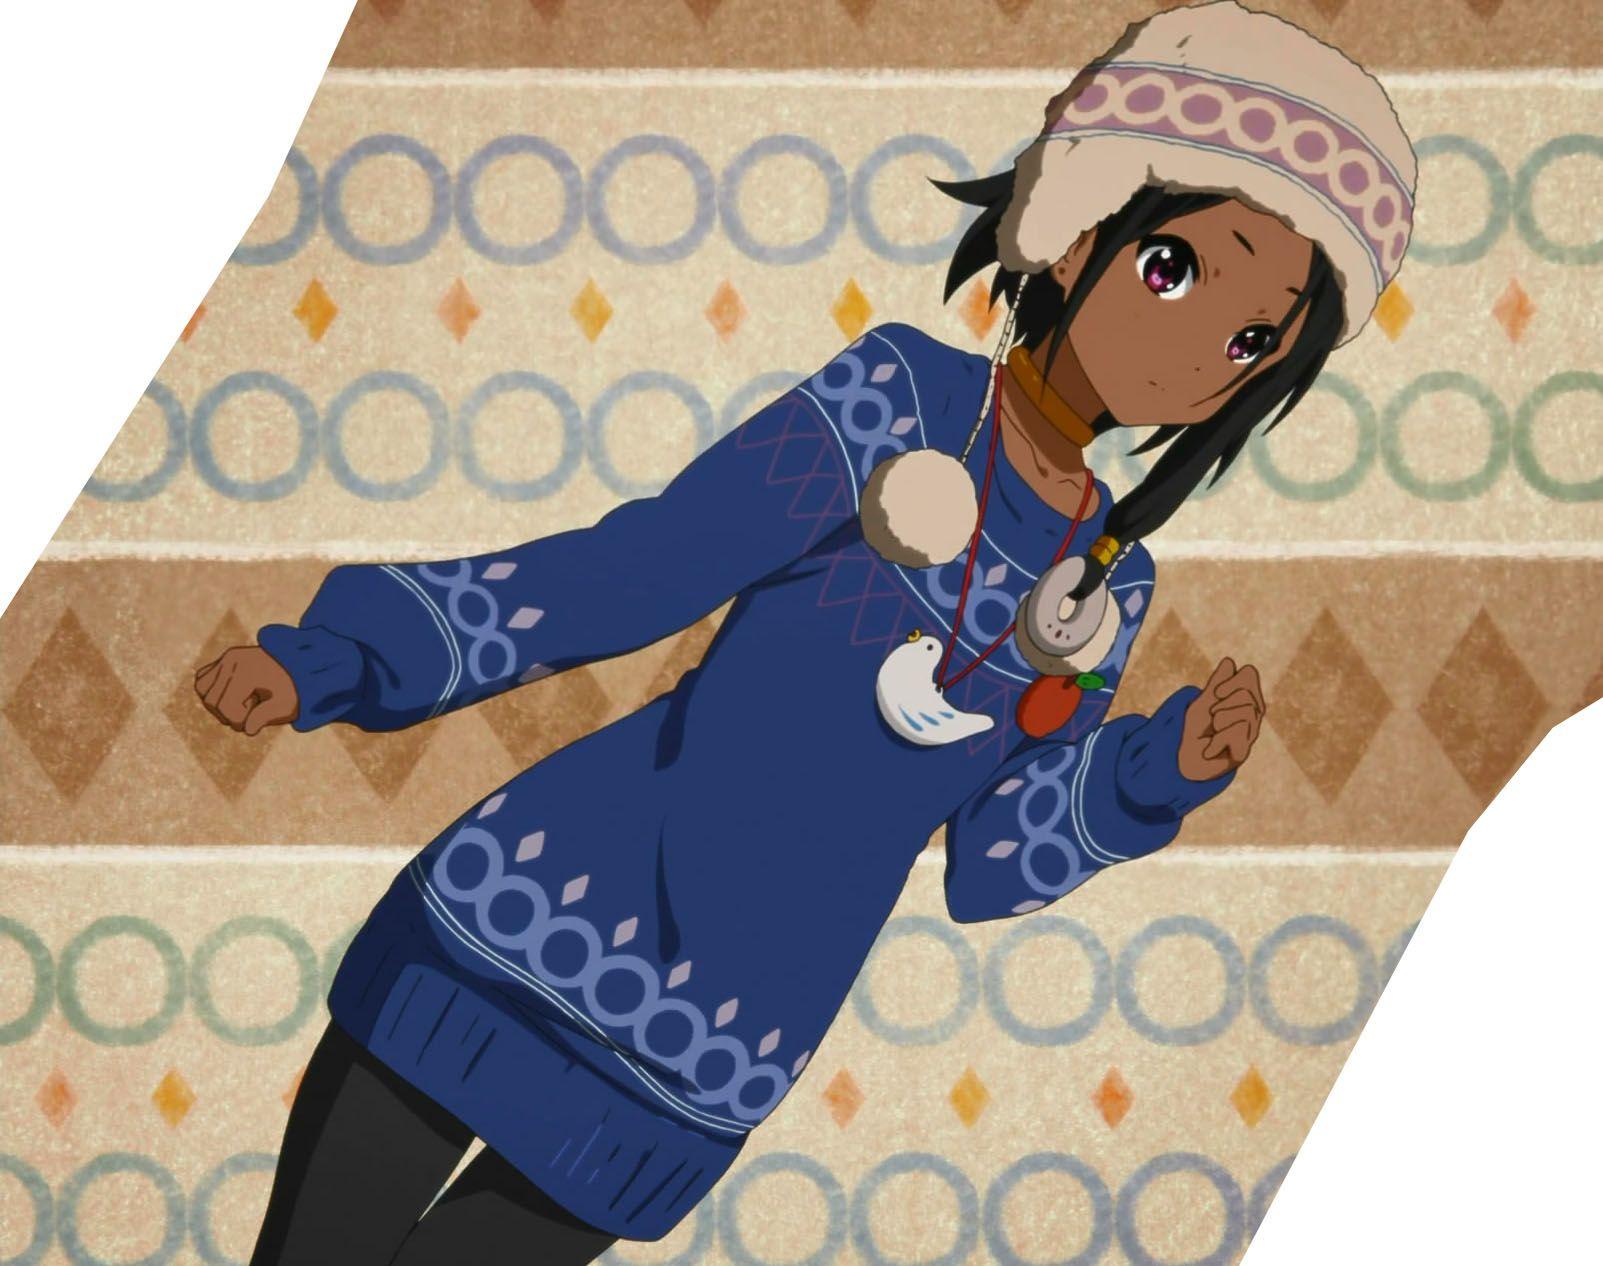 Http Media Animevice Com Uploads 1 18405 624890 Tamako Market 08 Large 26 Jpg Black Anime Characters Character Design Anime Chibi